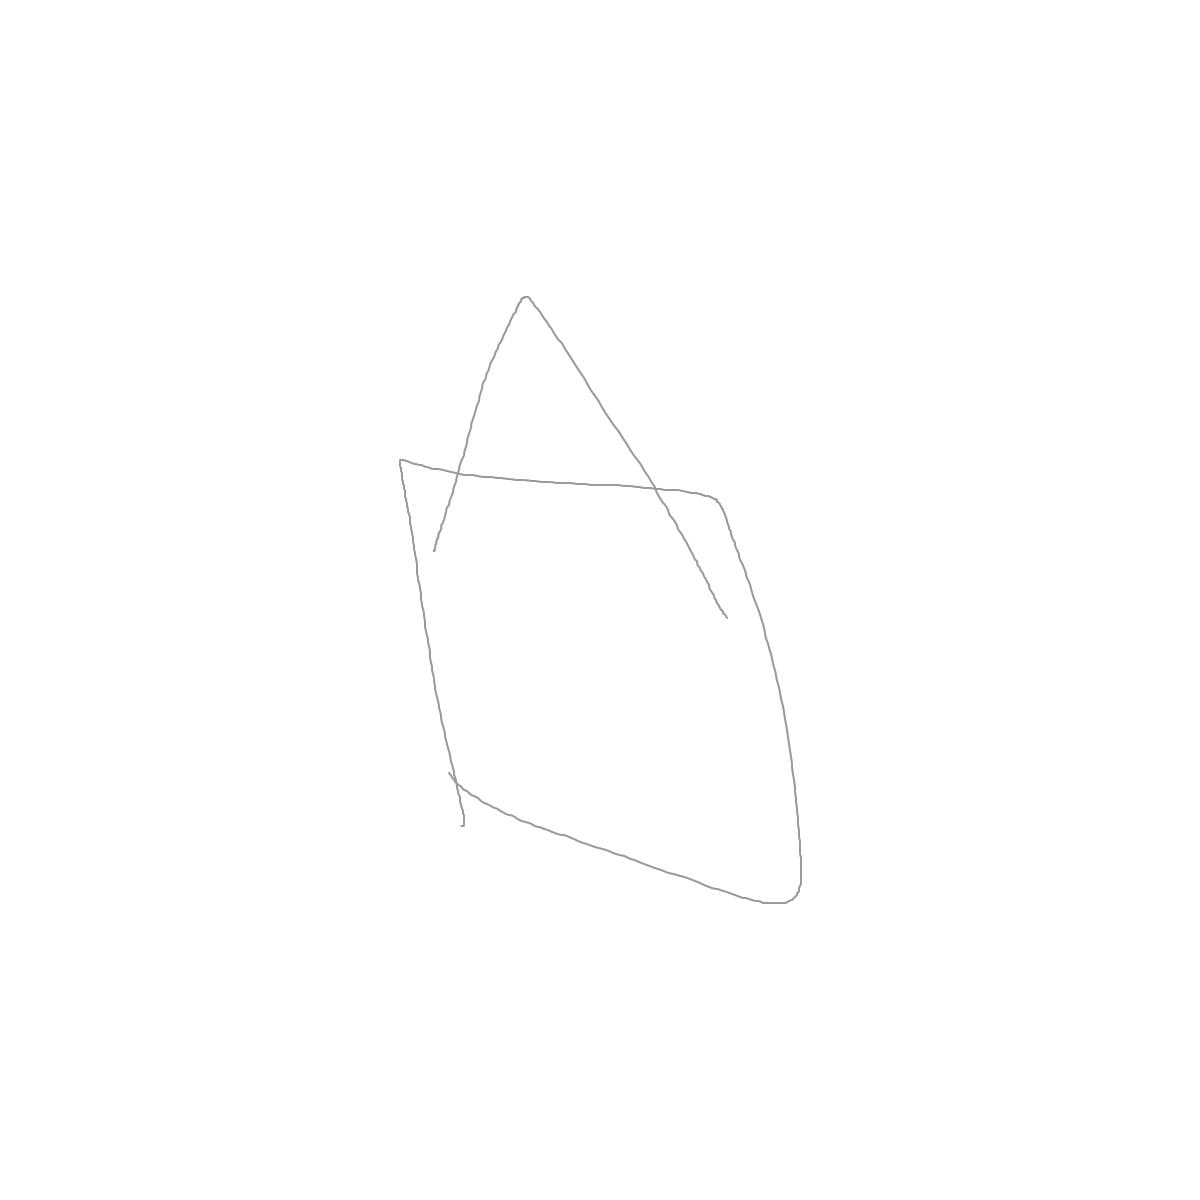 BAAAM drawing#918 lat:-32.0738525390625000lng: 115.7548904418945300